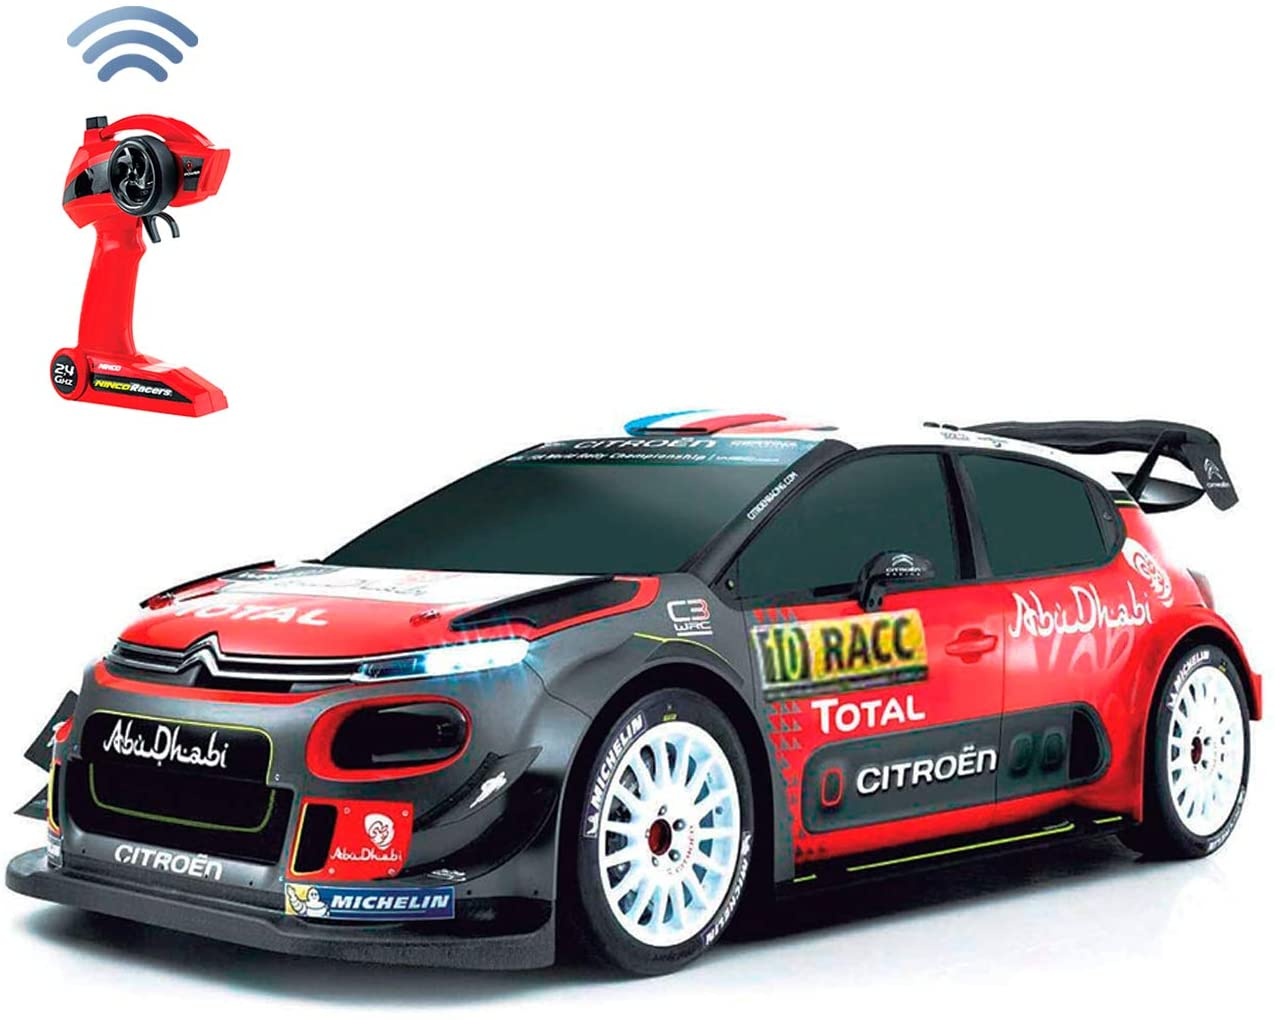 Ninco- Citroen C3 WRC Coche Radiocontrol, Multicolor (NH93150)